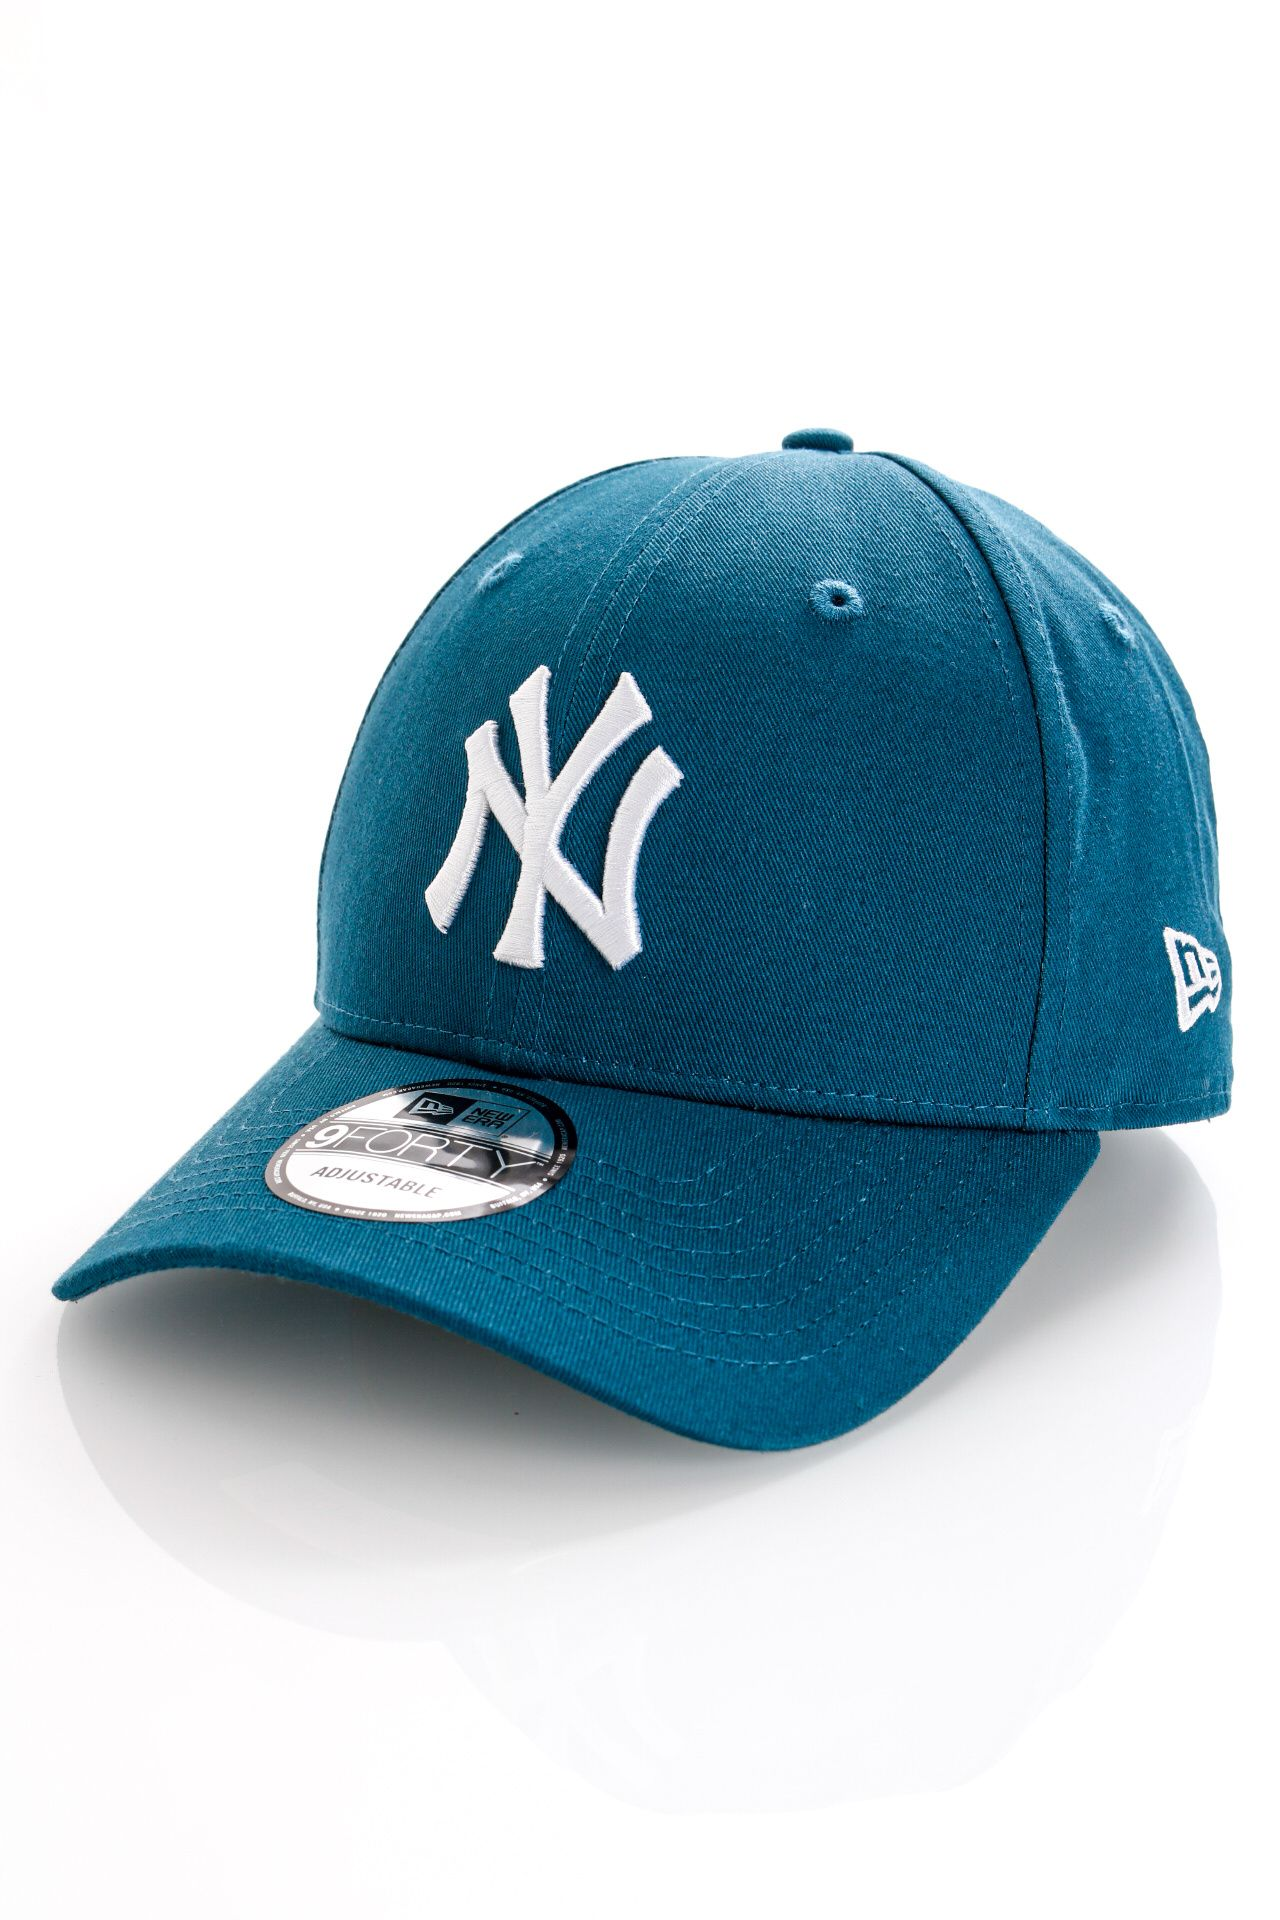 Afbeelding van New Era New York Yankees Dad Cap LEAGUE ESSENTIAL 9FORTY NEYYAN Blue/White NE60185598